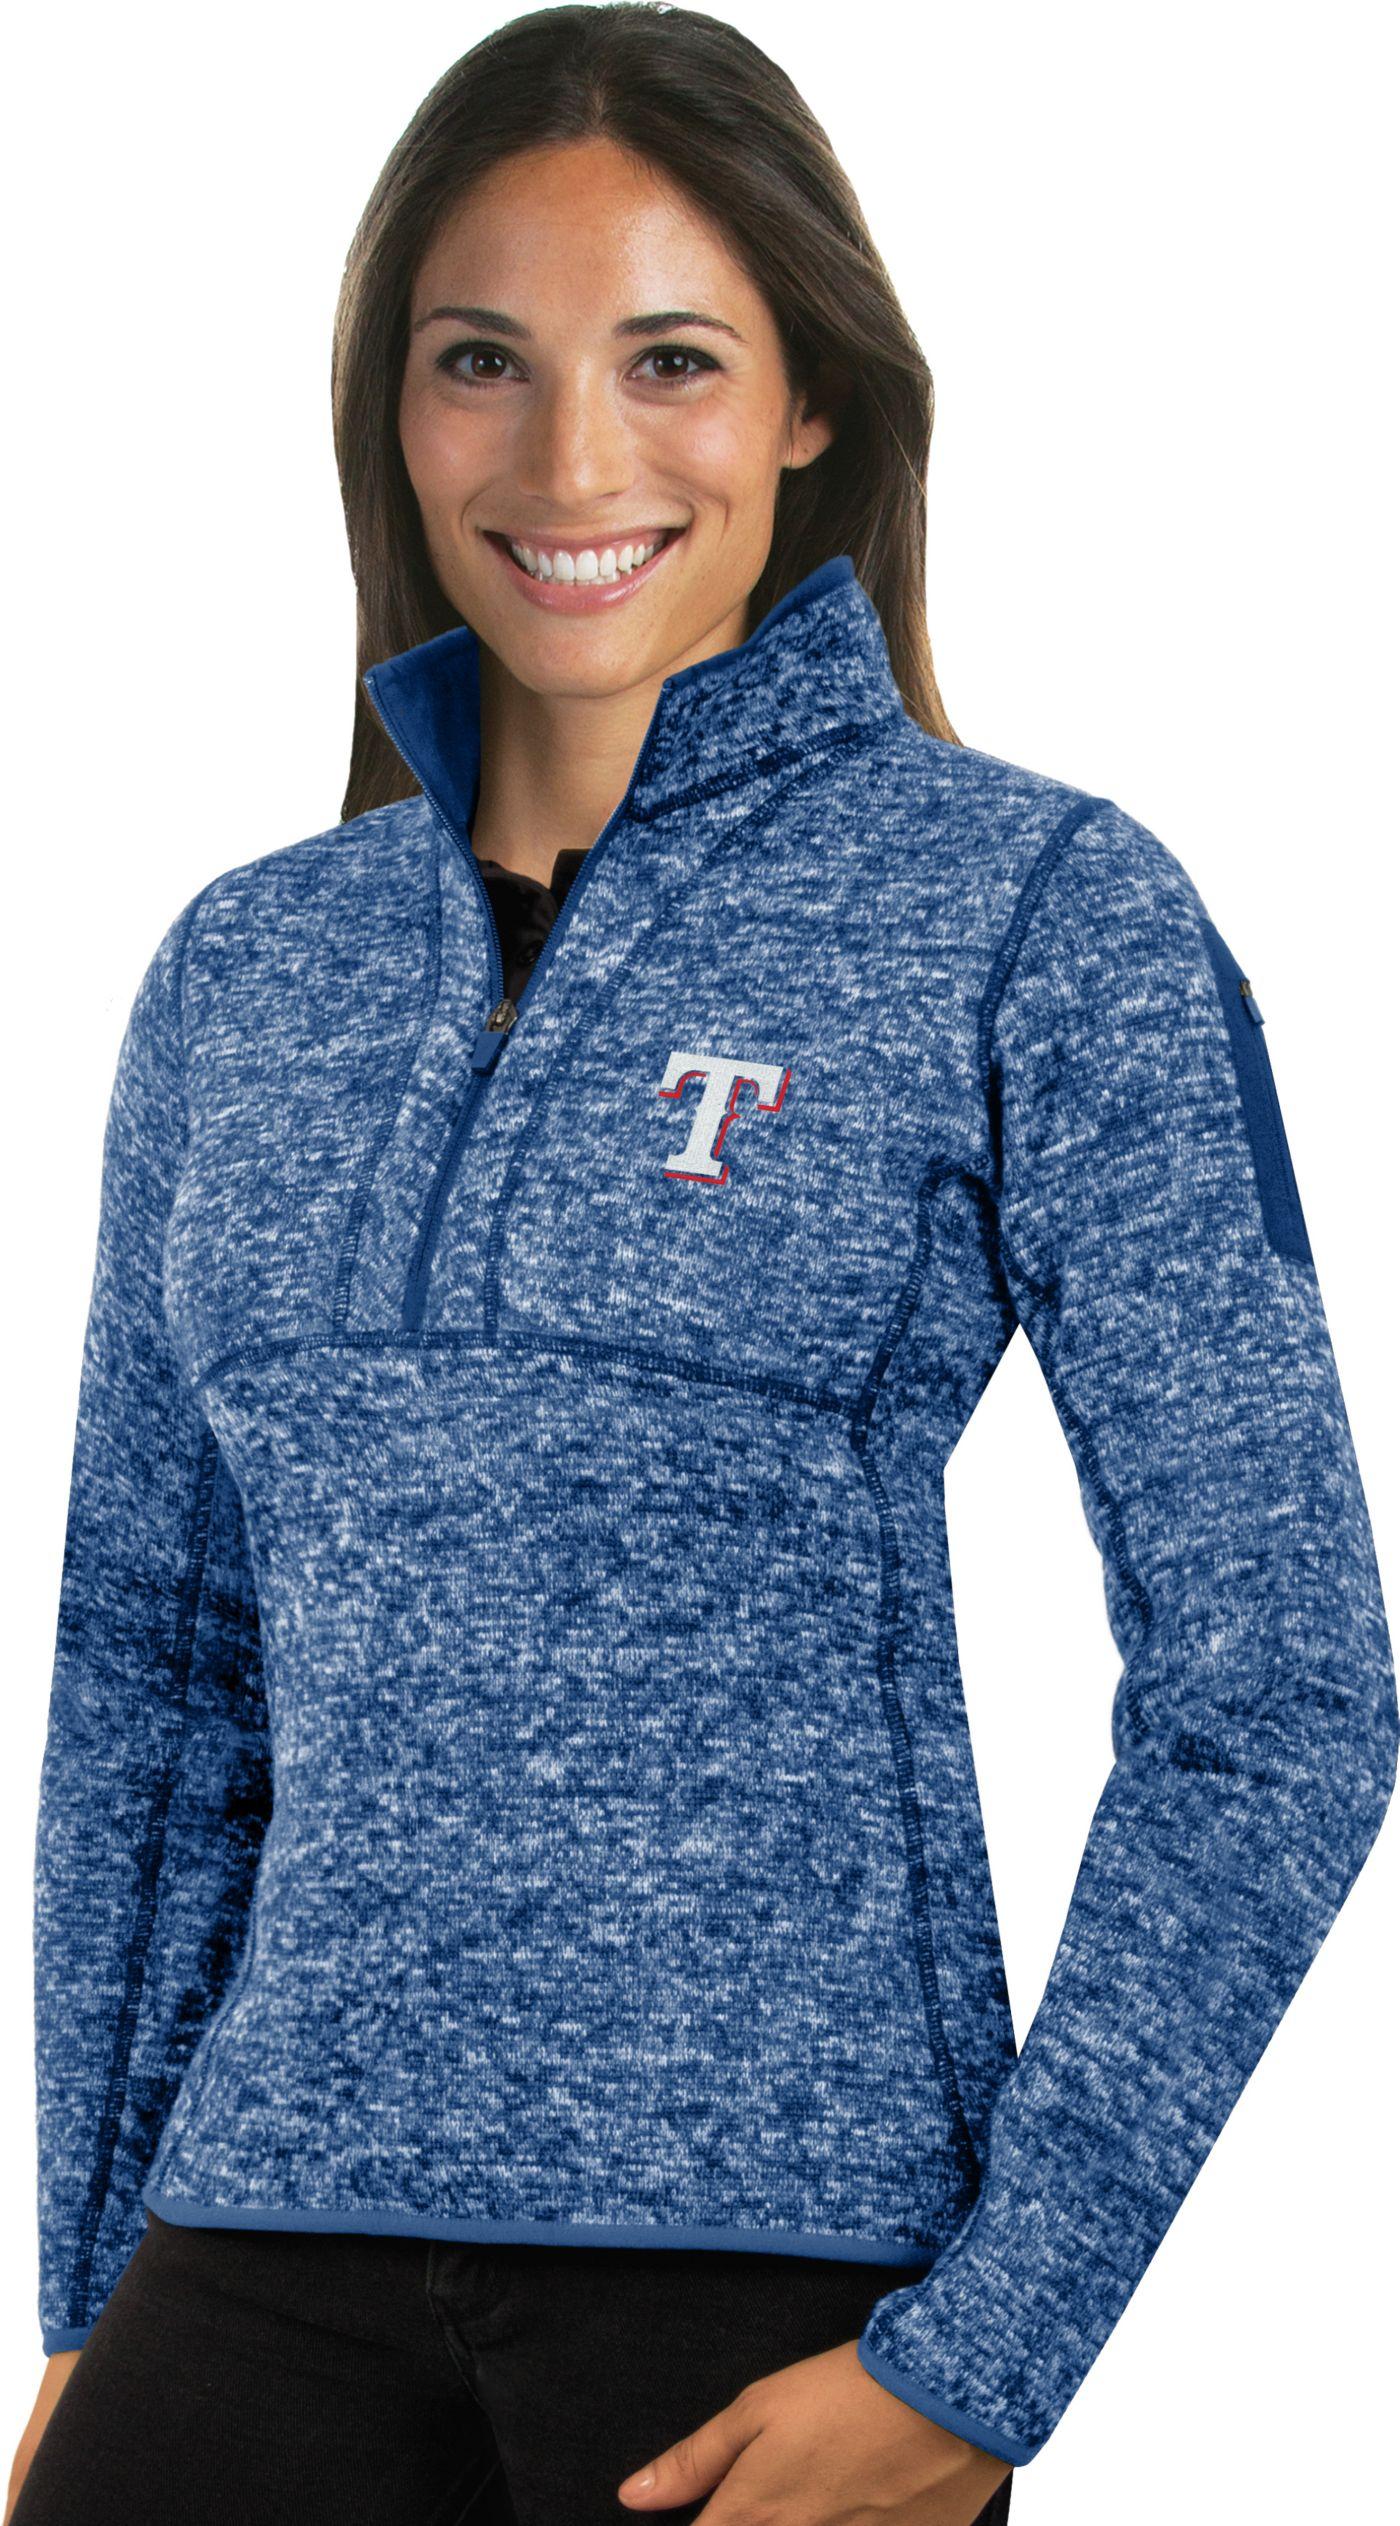 Antigua Women's Texas Rangers Royal Fortune Half-Zip Pullover